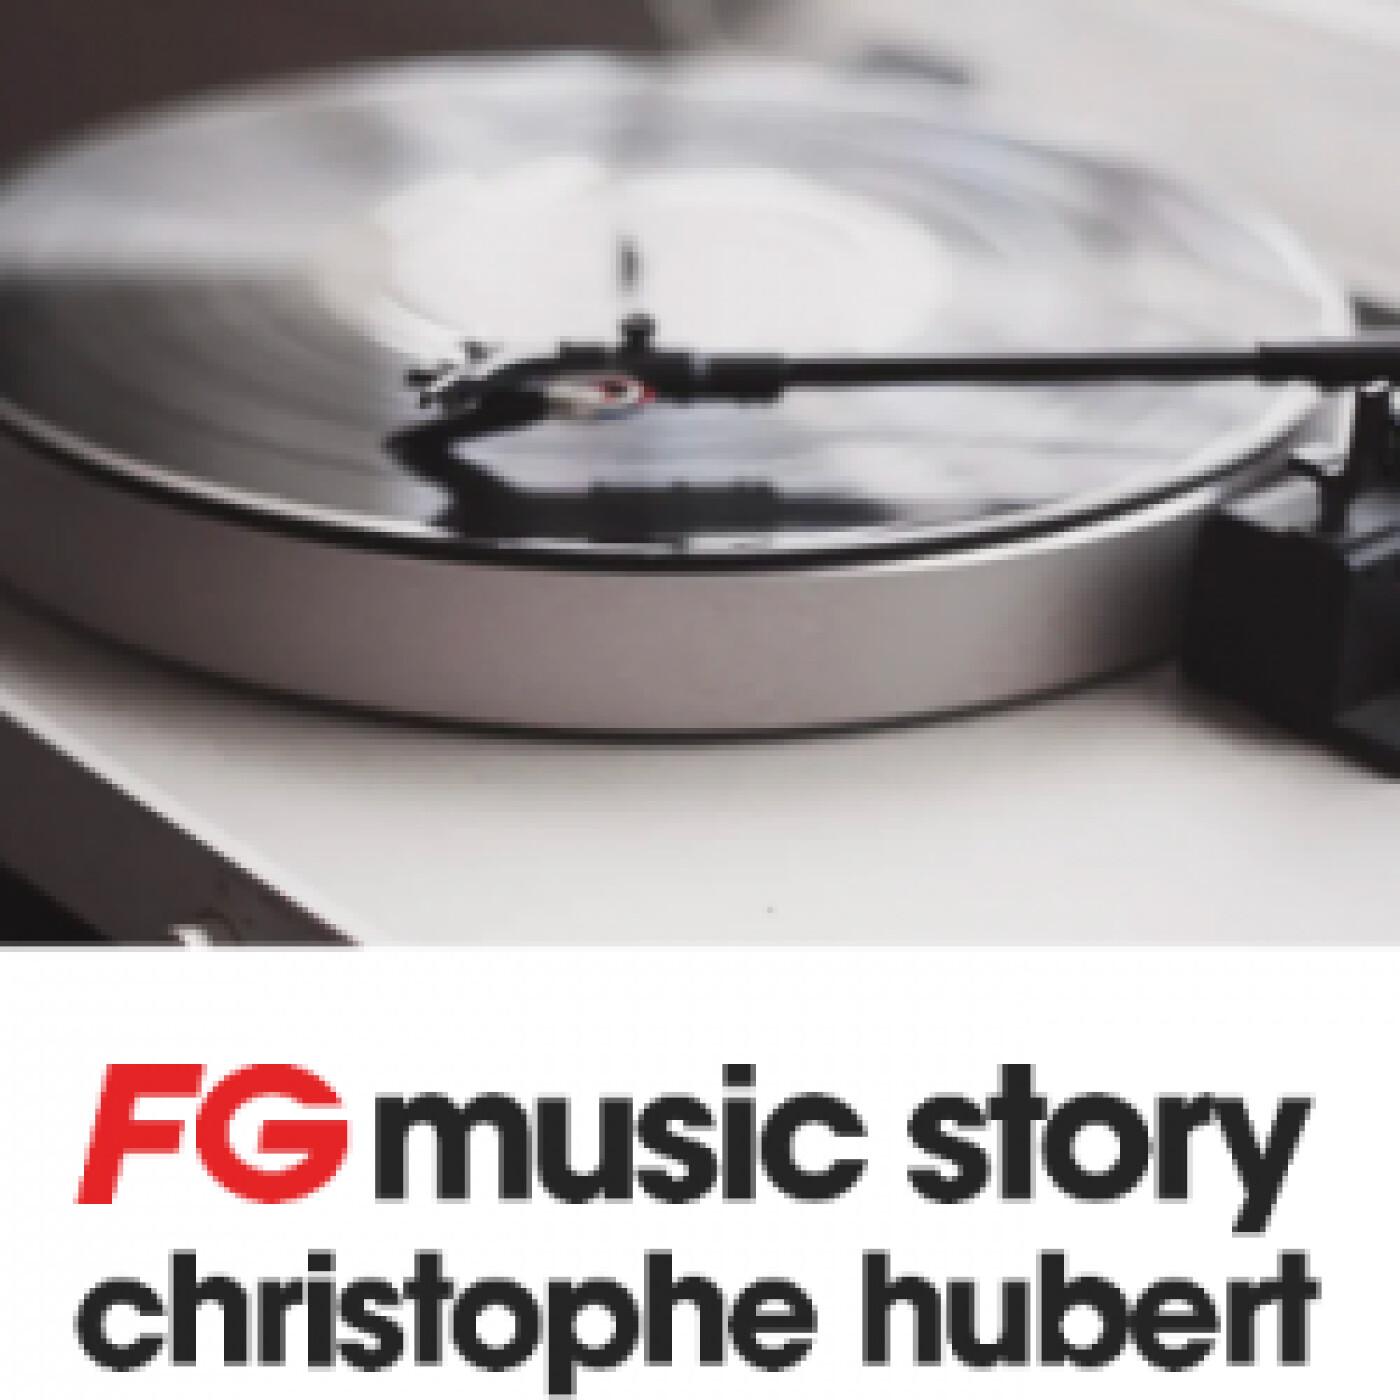 FG MUSIC STORY : JOE SMOOTH